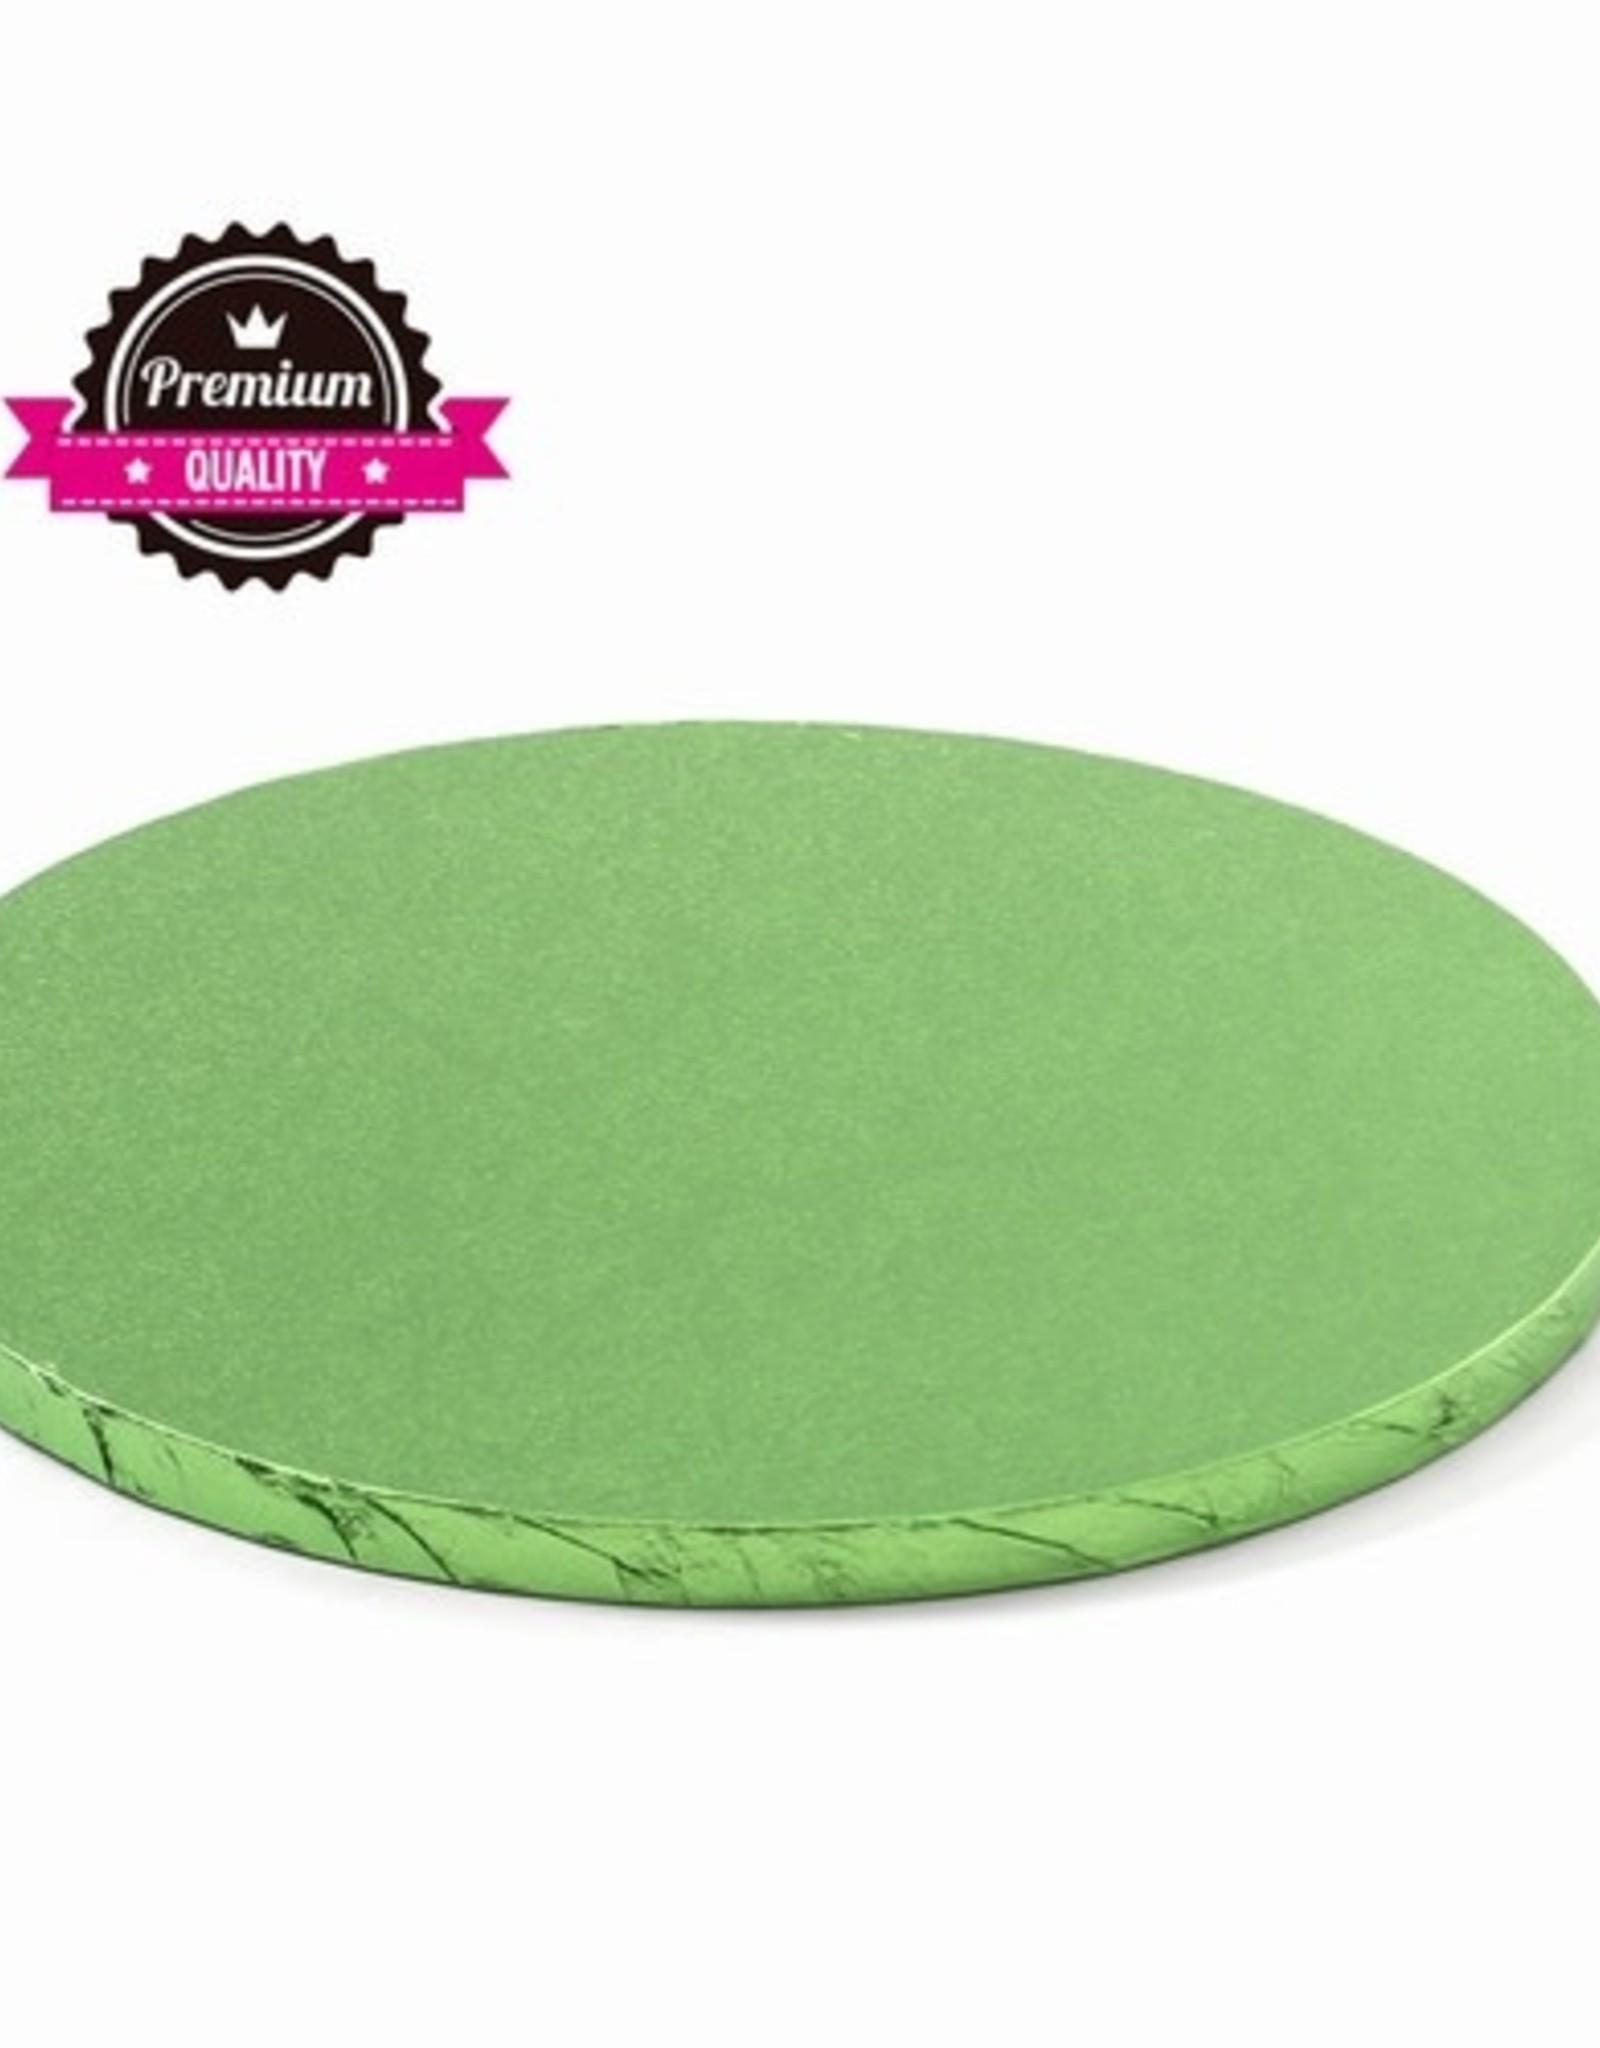 Cake Drum Rond Ø40cm Soft Green